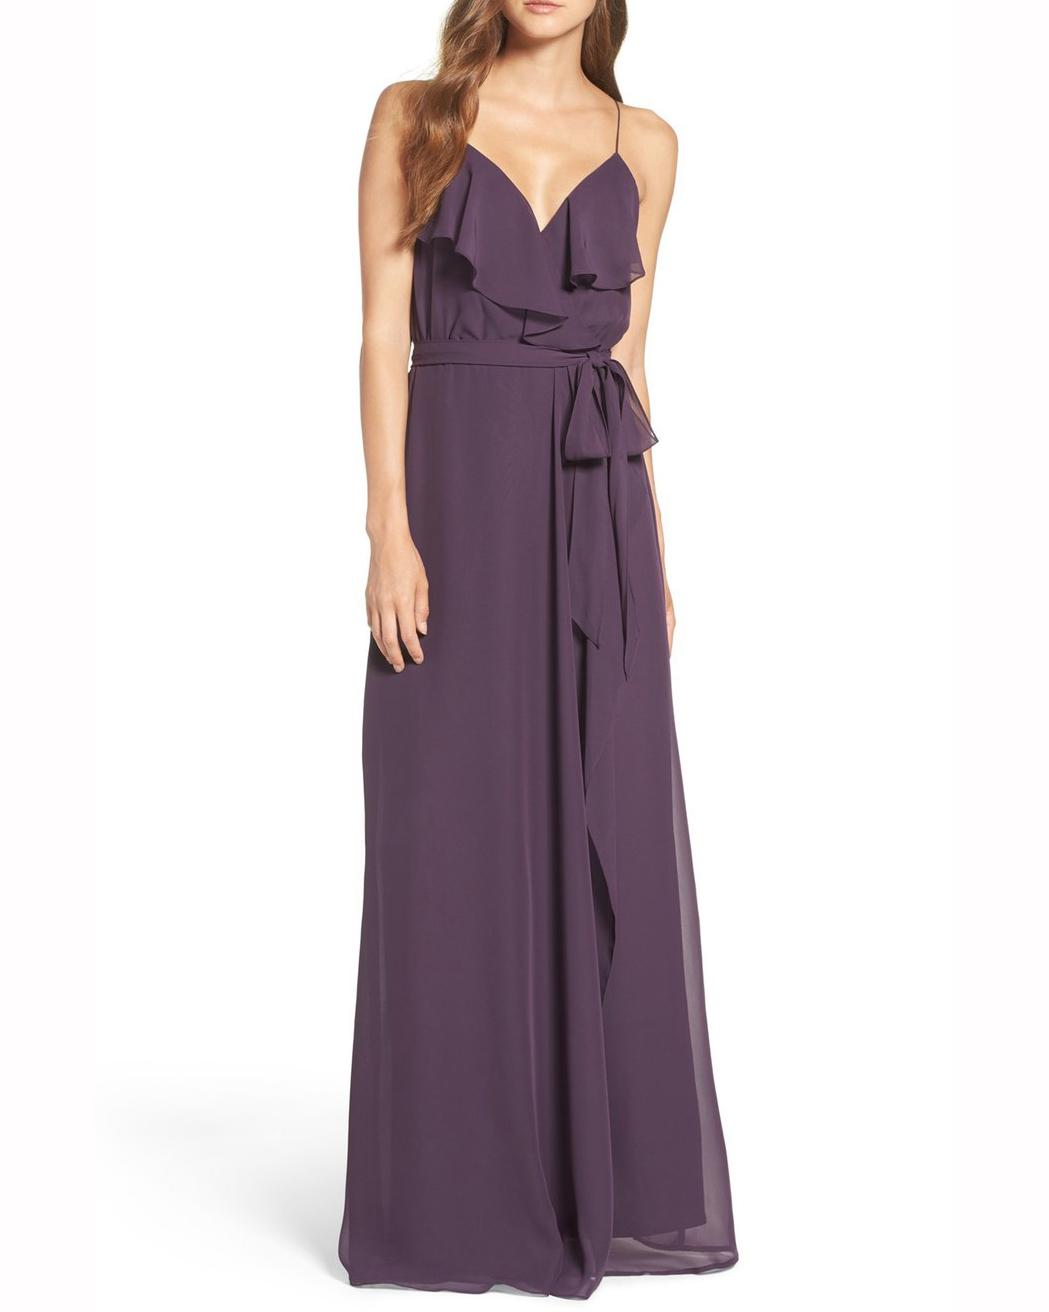 bridesmaid dress